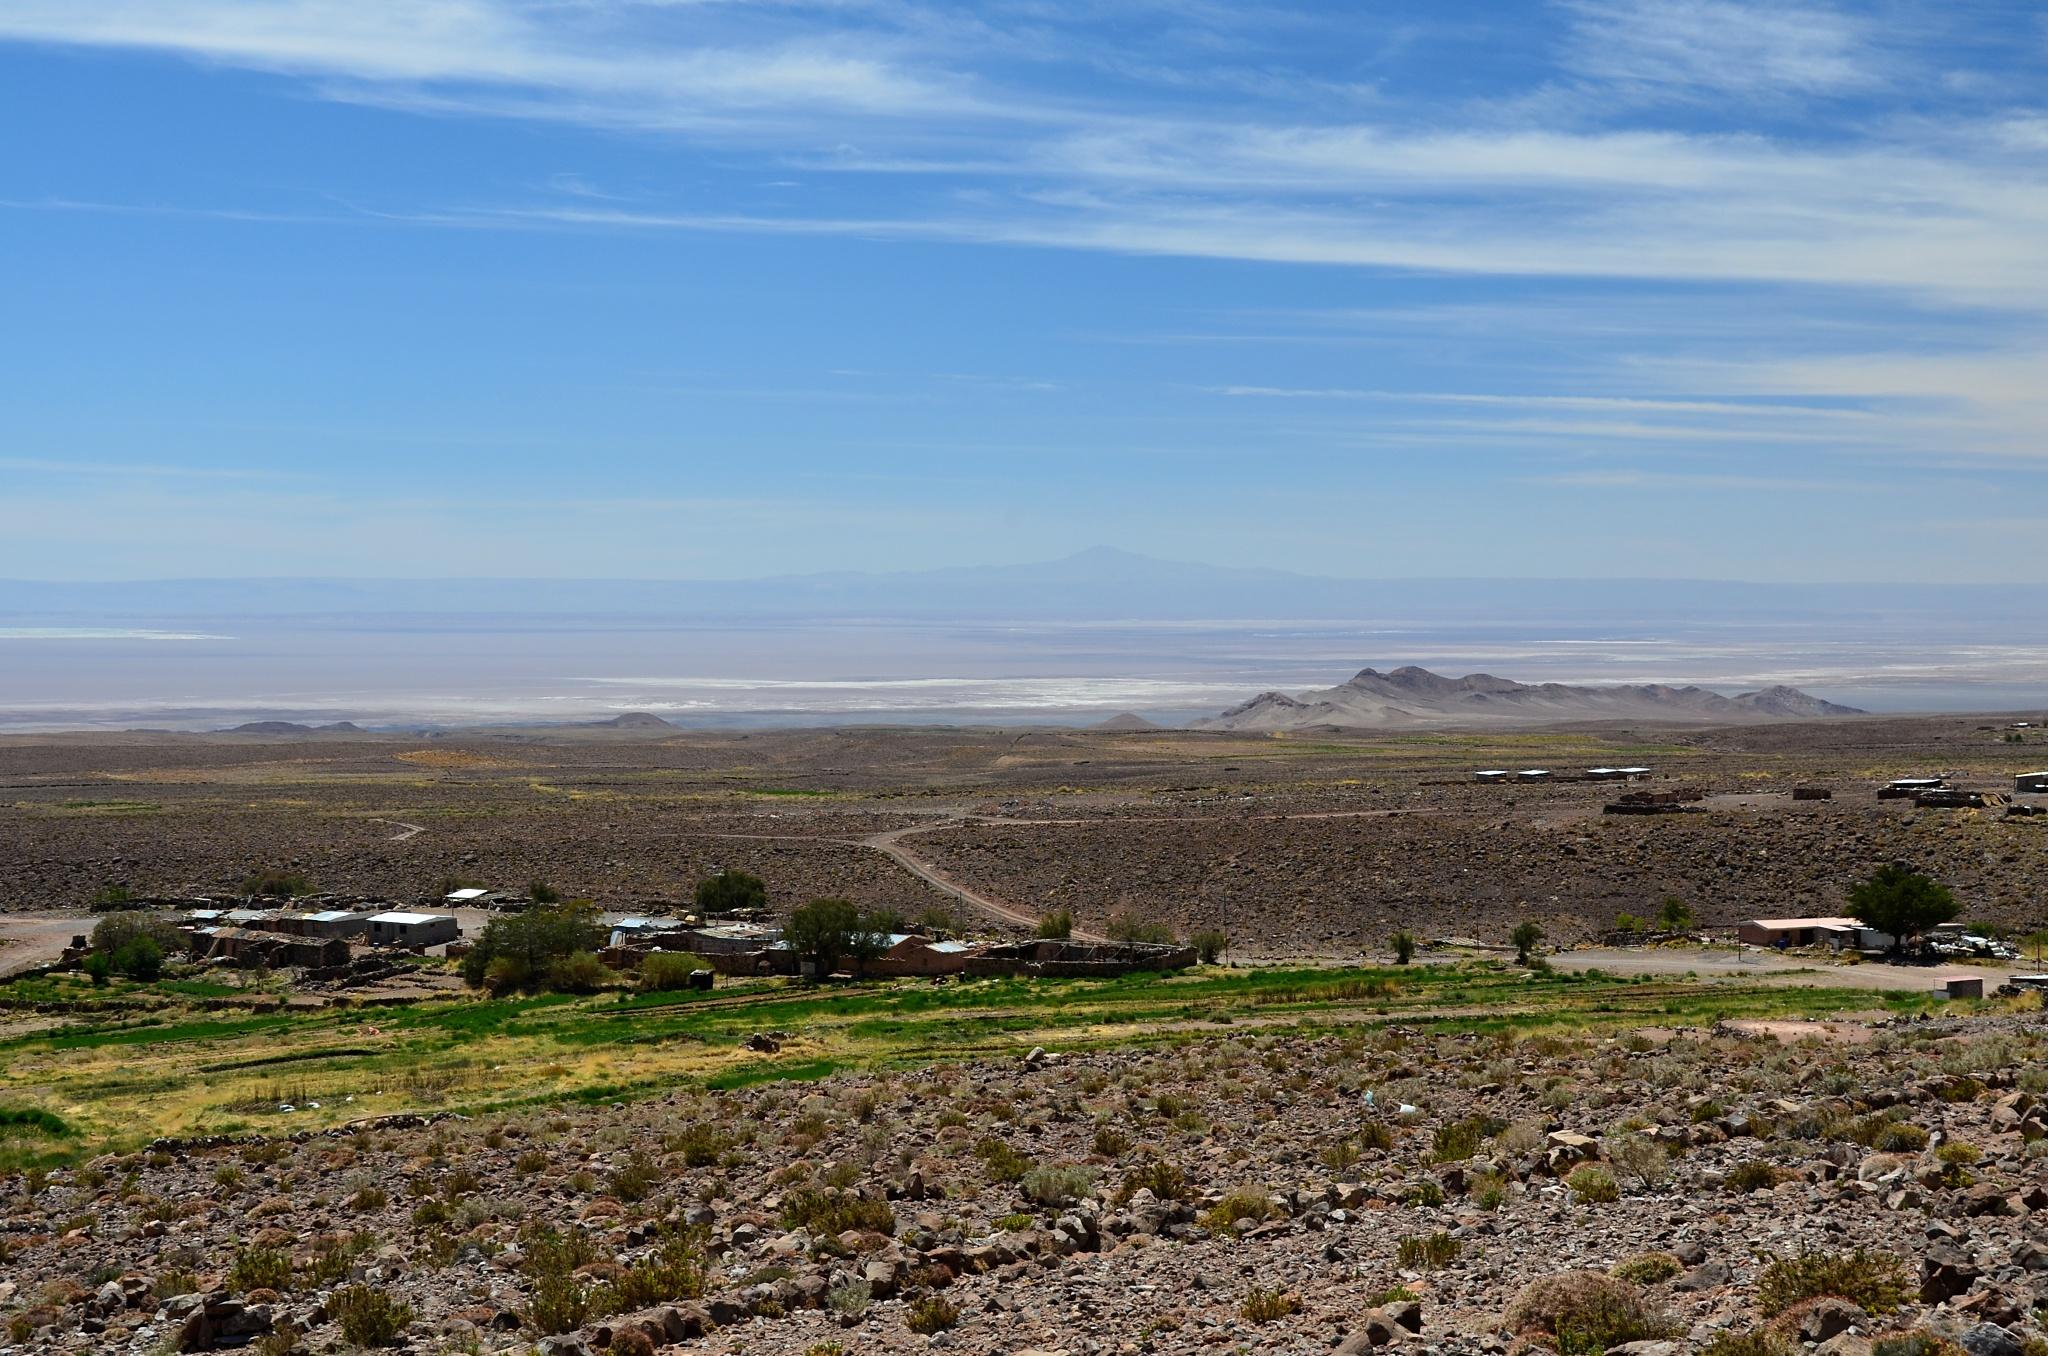 Malá vesnice Socaire, v pozadí poušť Atacama